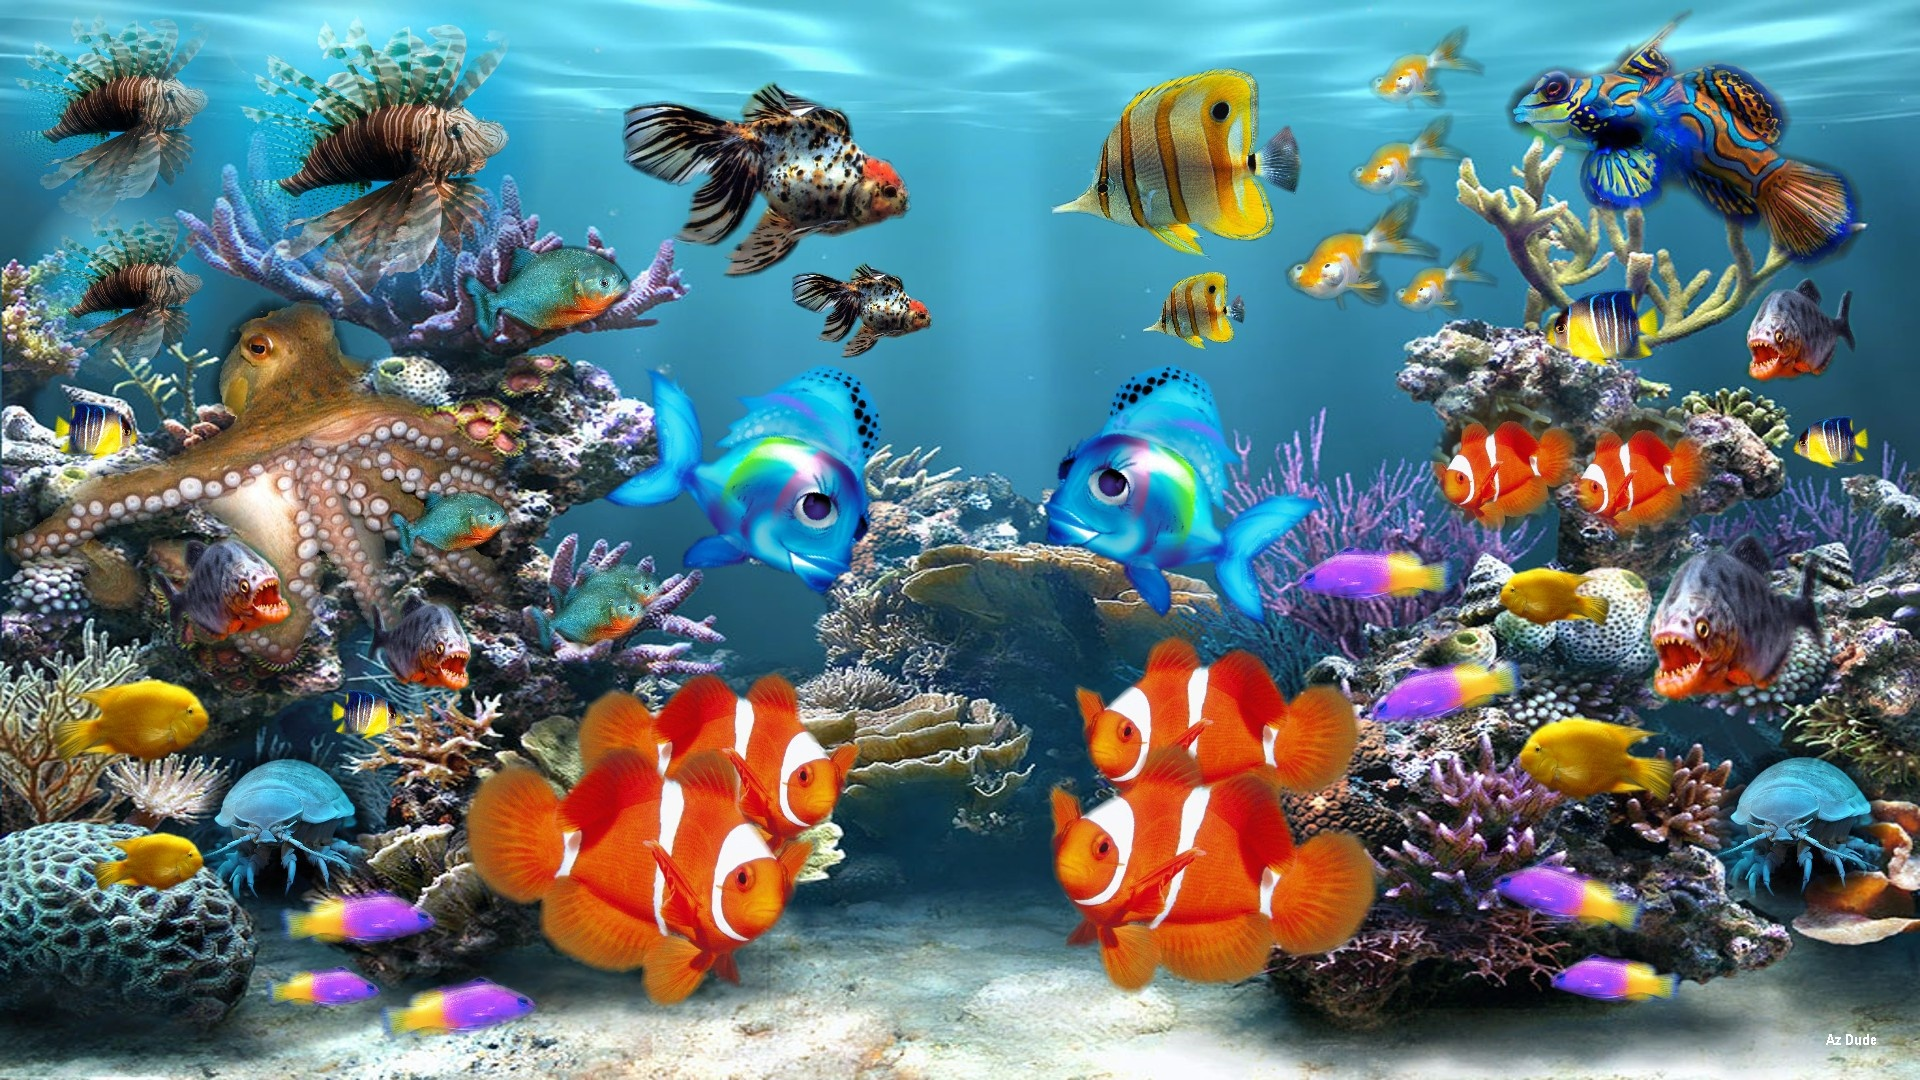 Fonds dcran Aquarium PC et Tablettes iPad etc 1920x1080